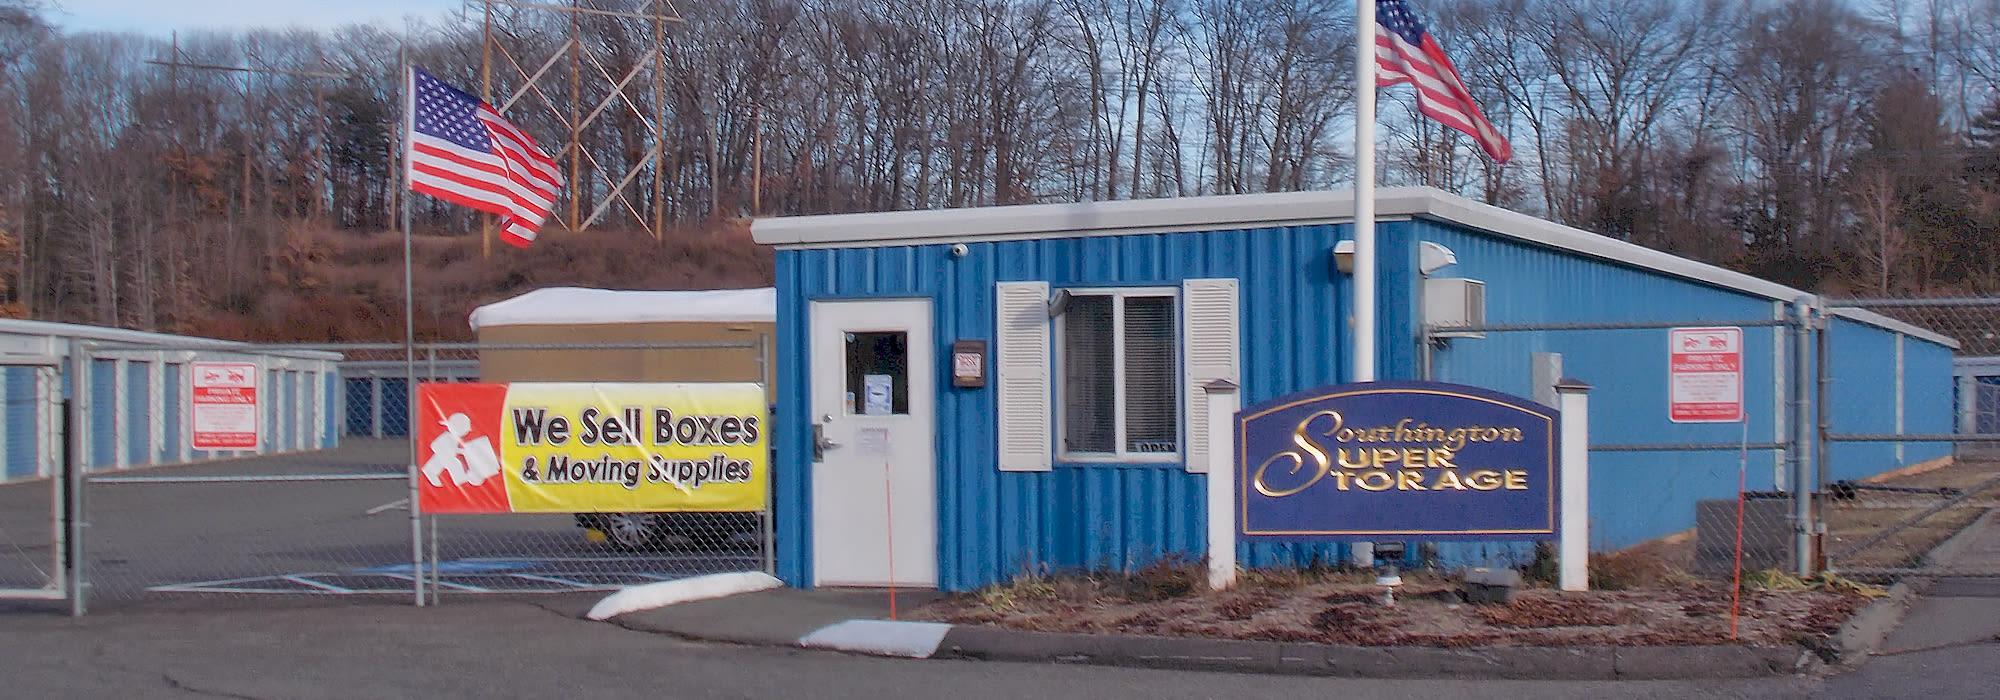 Southington Super Storage in Plantsville, CT